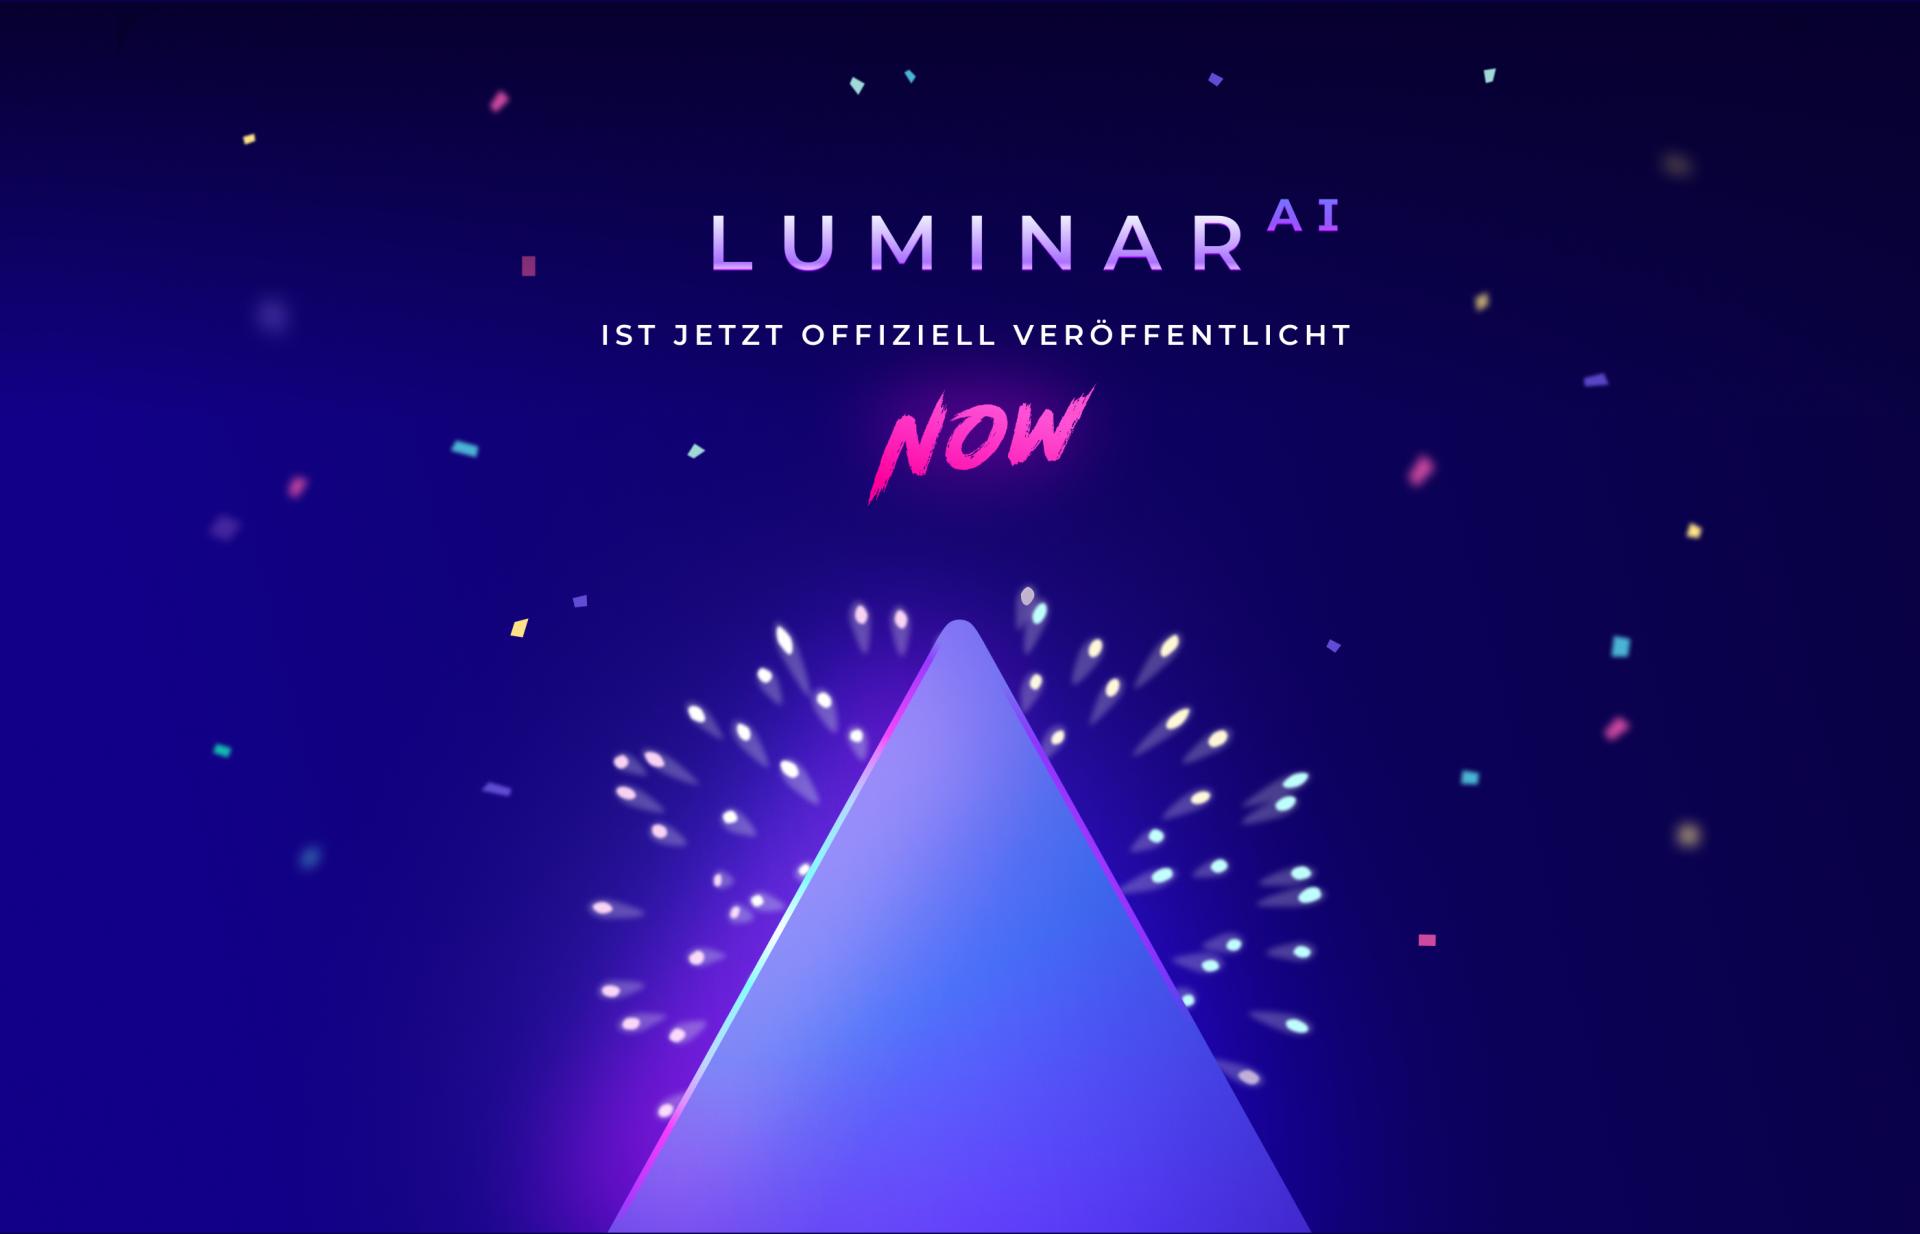 LuminarAI verfügbar